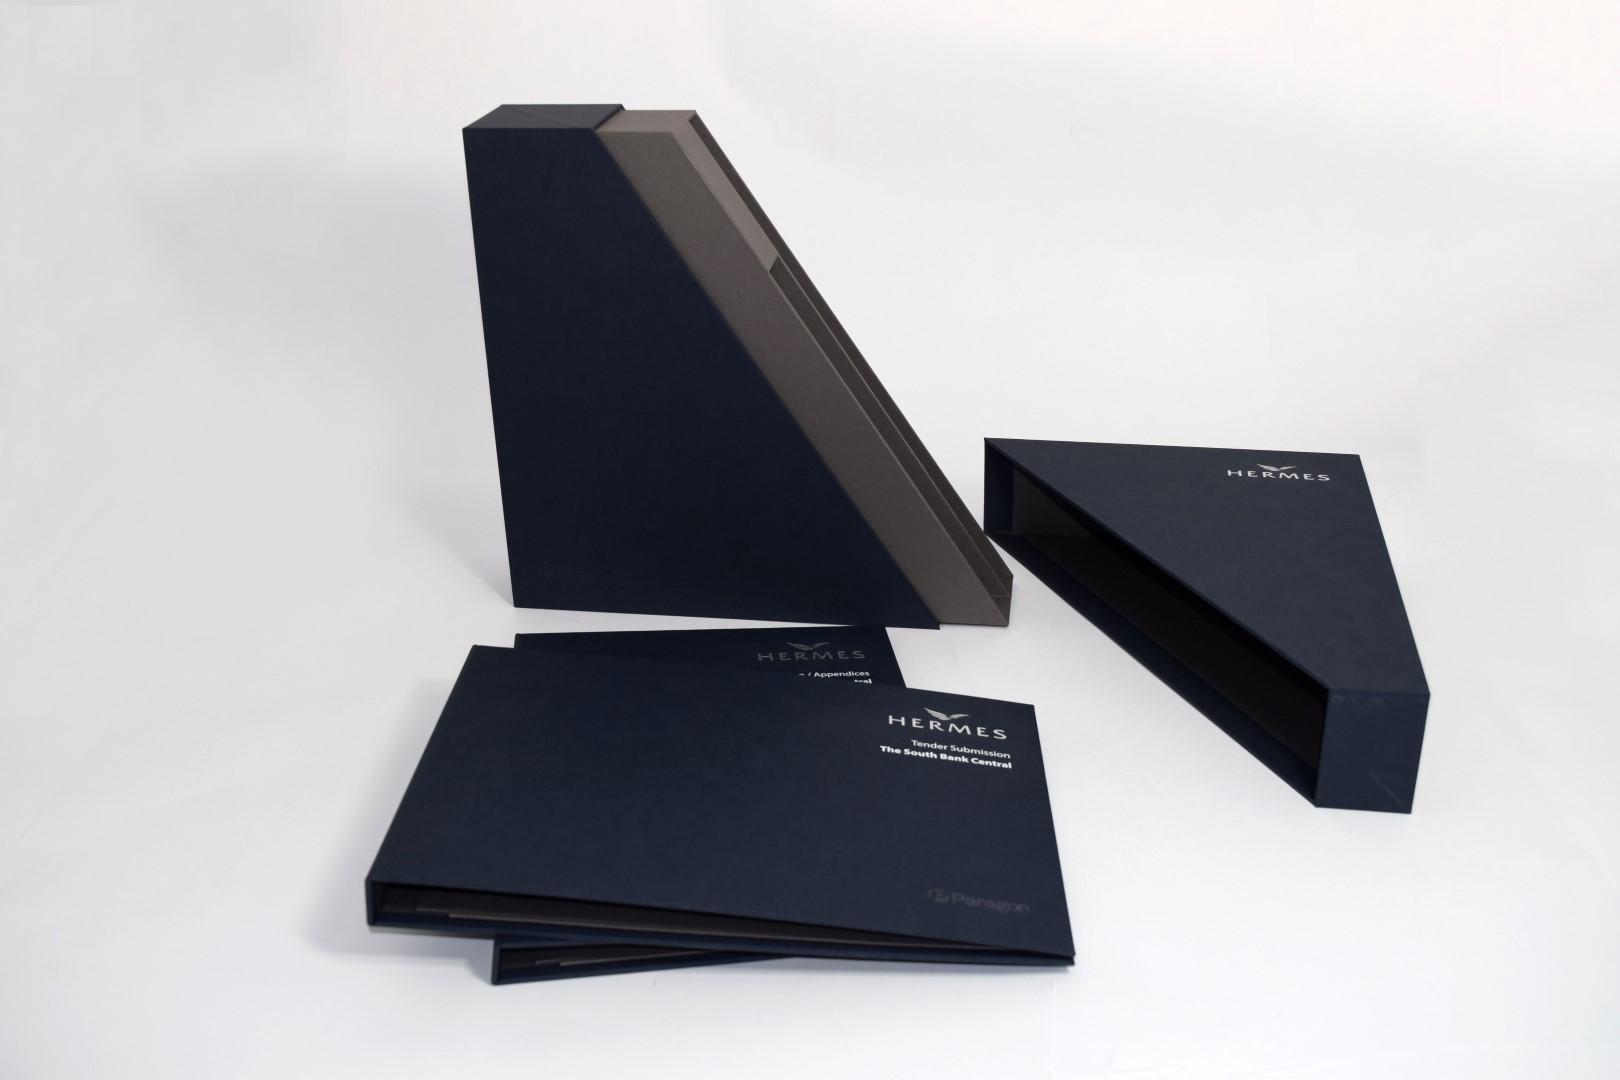 Presentation Bid Box